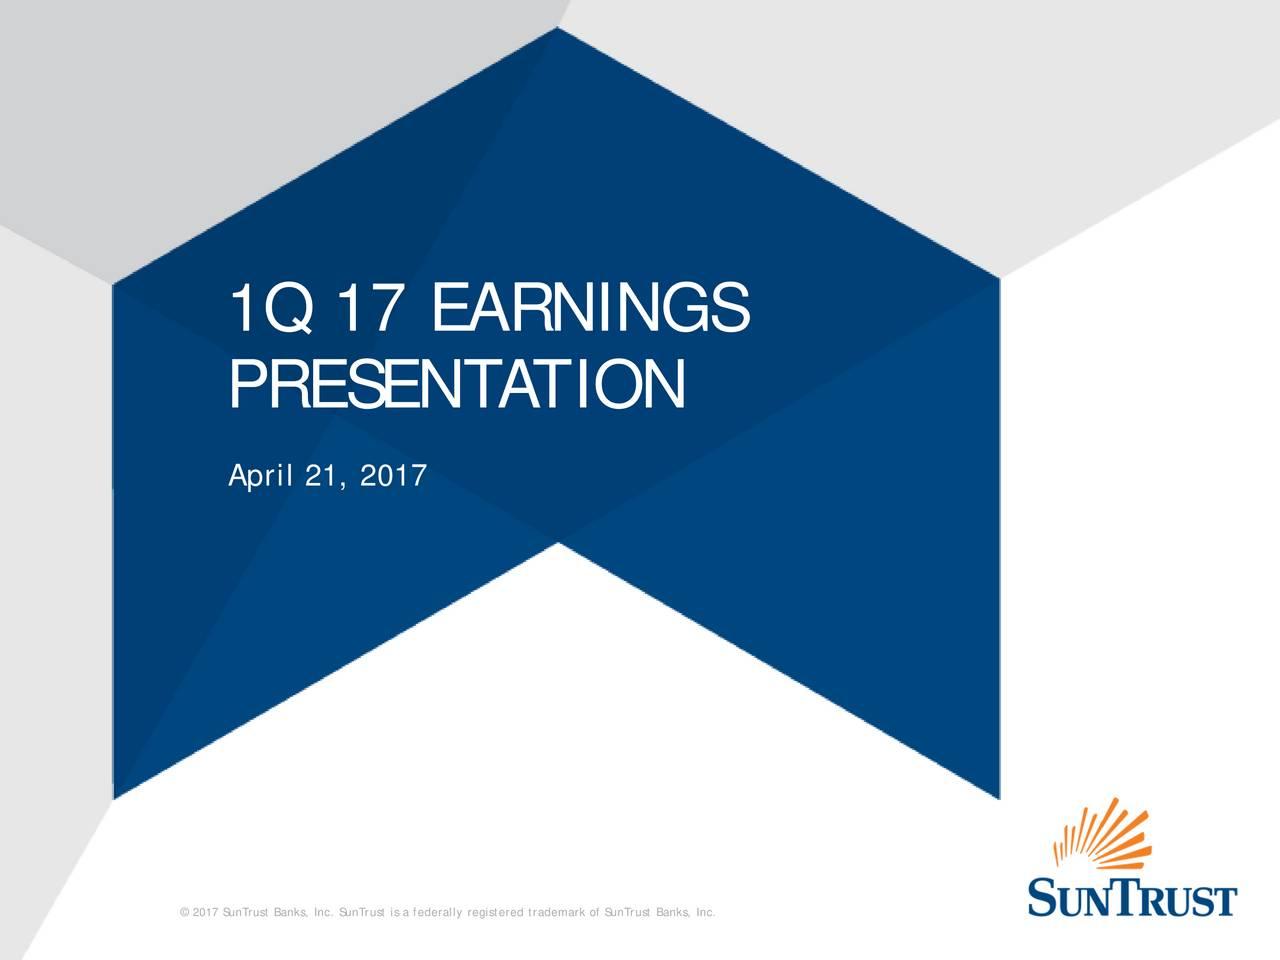 PRESENT ATION April 21, 2017 2017 SunTrust Banks, Inc. SunTrust is a federally registered trademark of SunTrust Banks, Inc.